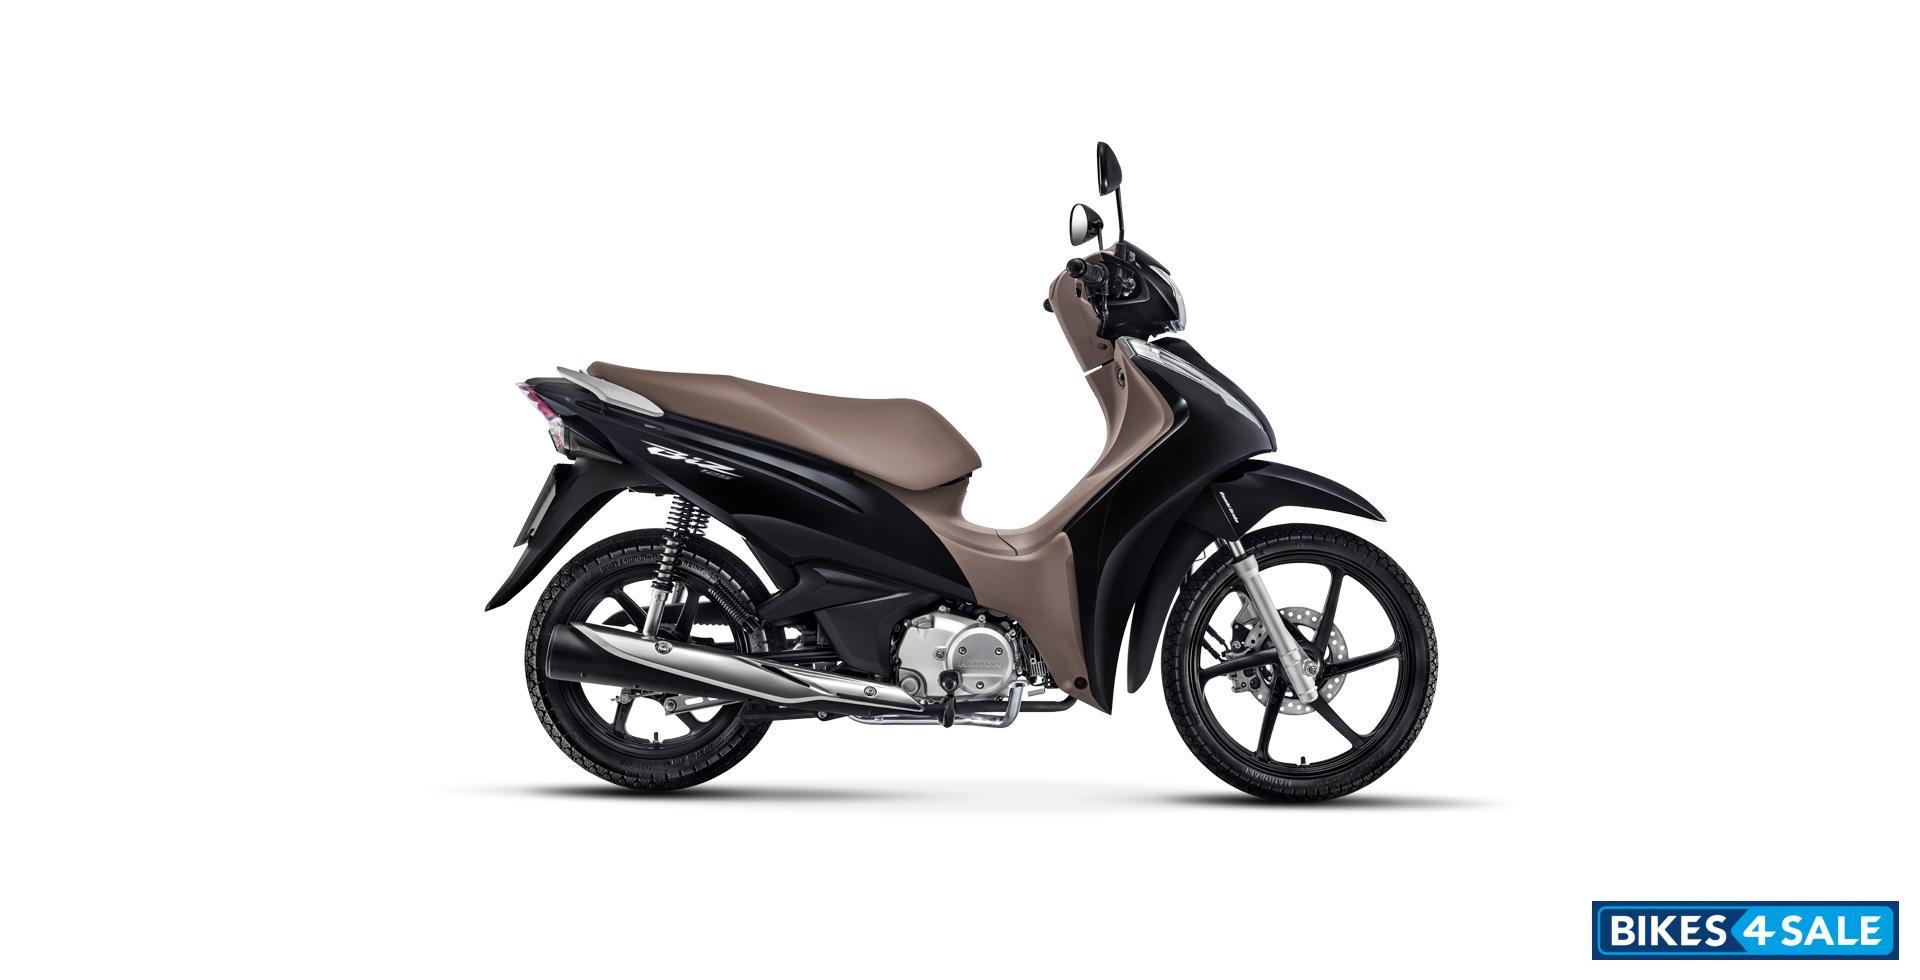 Honda Biz 125 Price Specs Mileage Colours Photos And Reviews